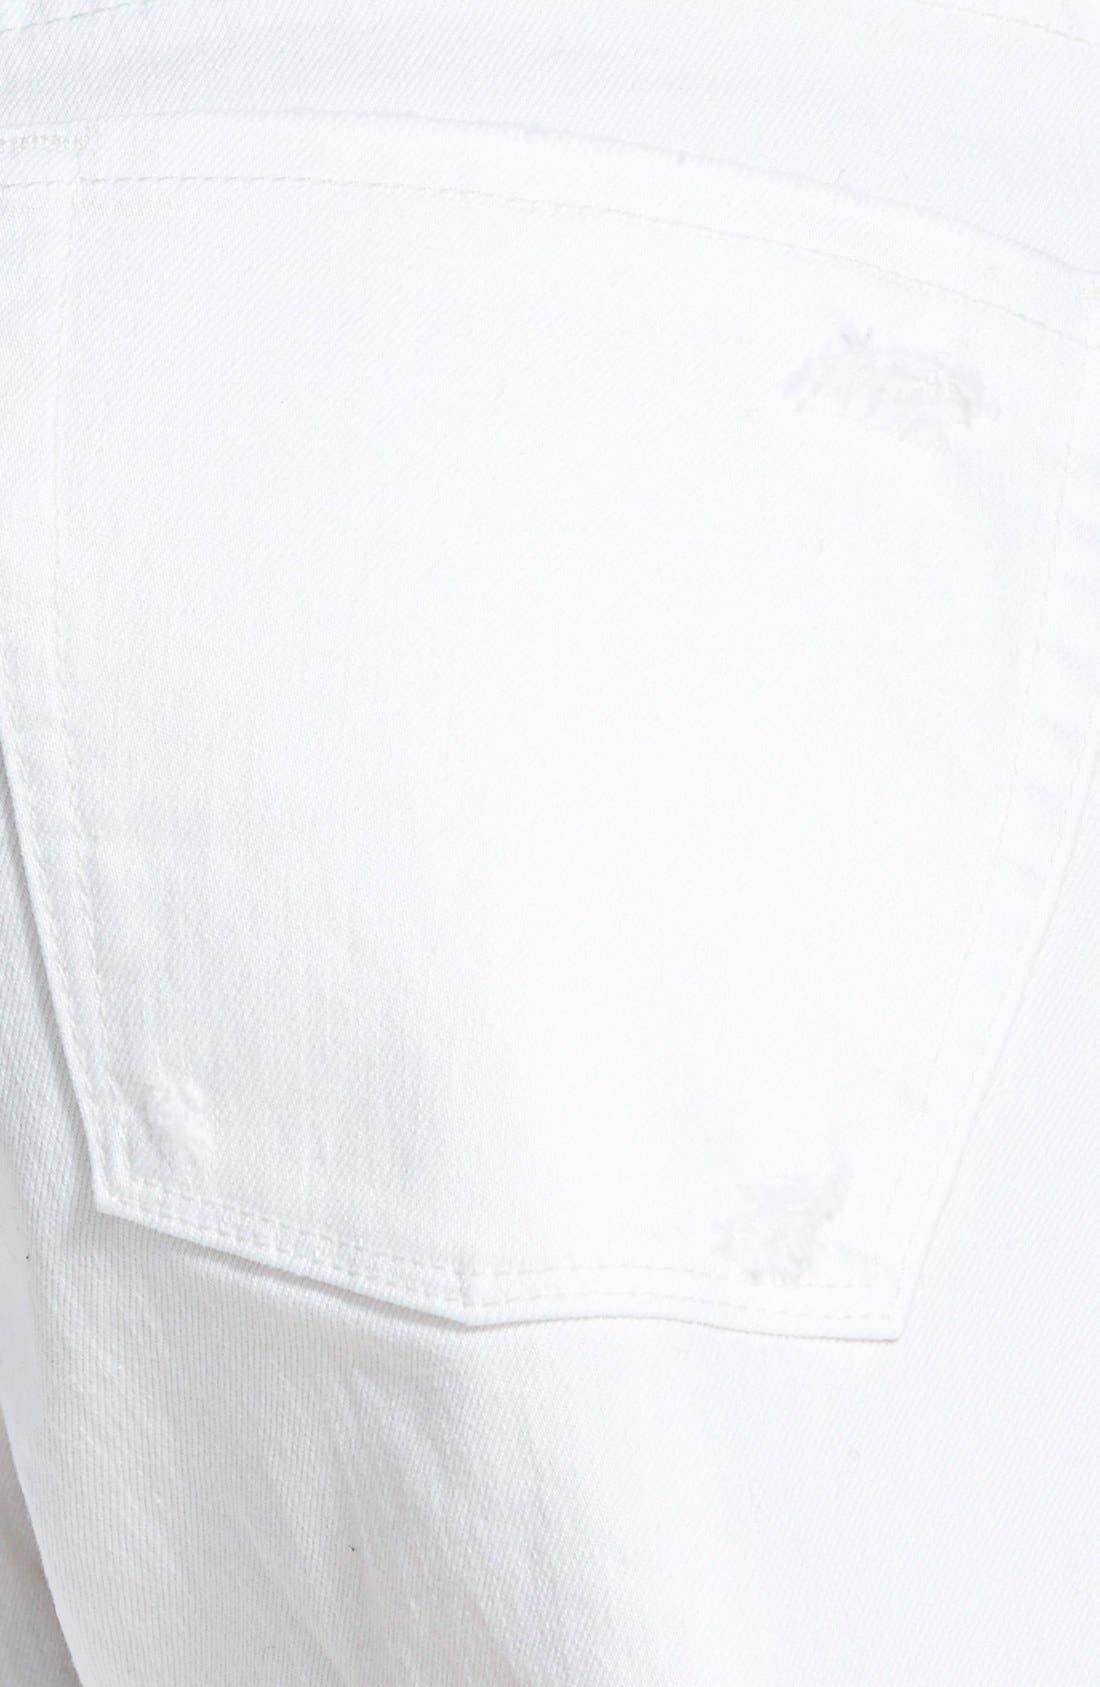 Alternate Image 3  - Treasure&Bond Cutoff Shorts (White Worn)